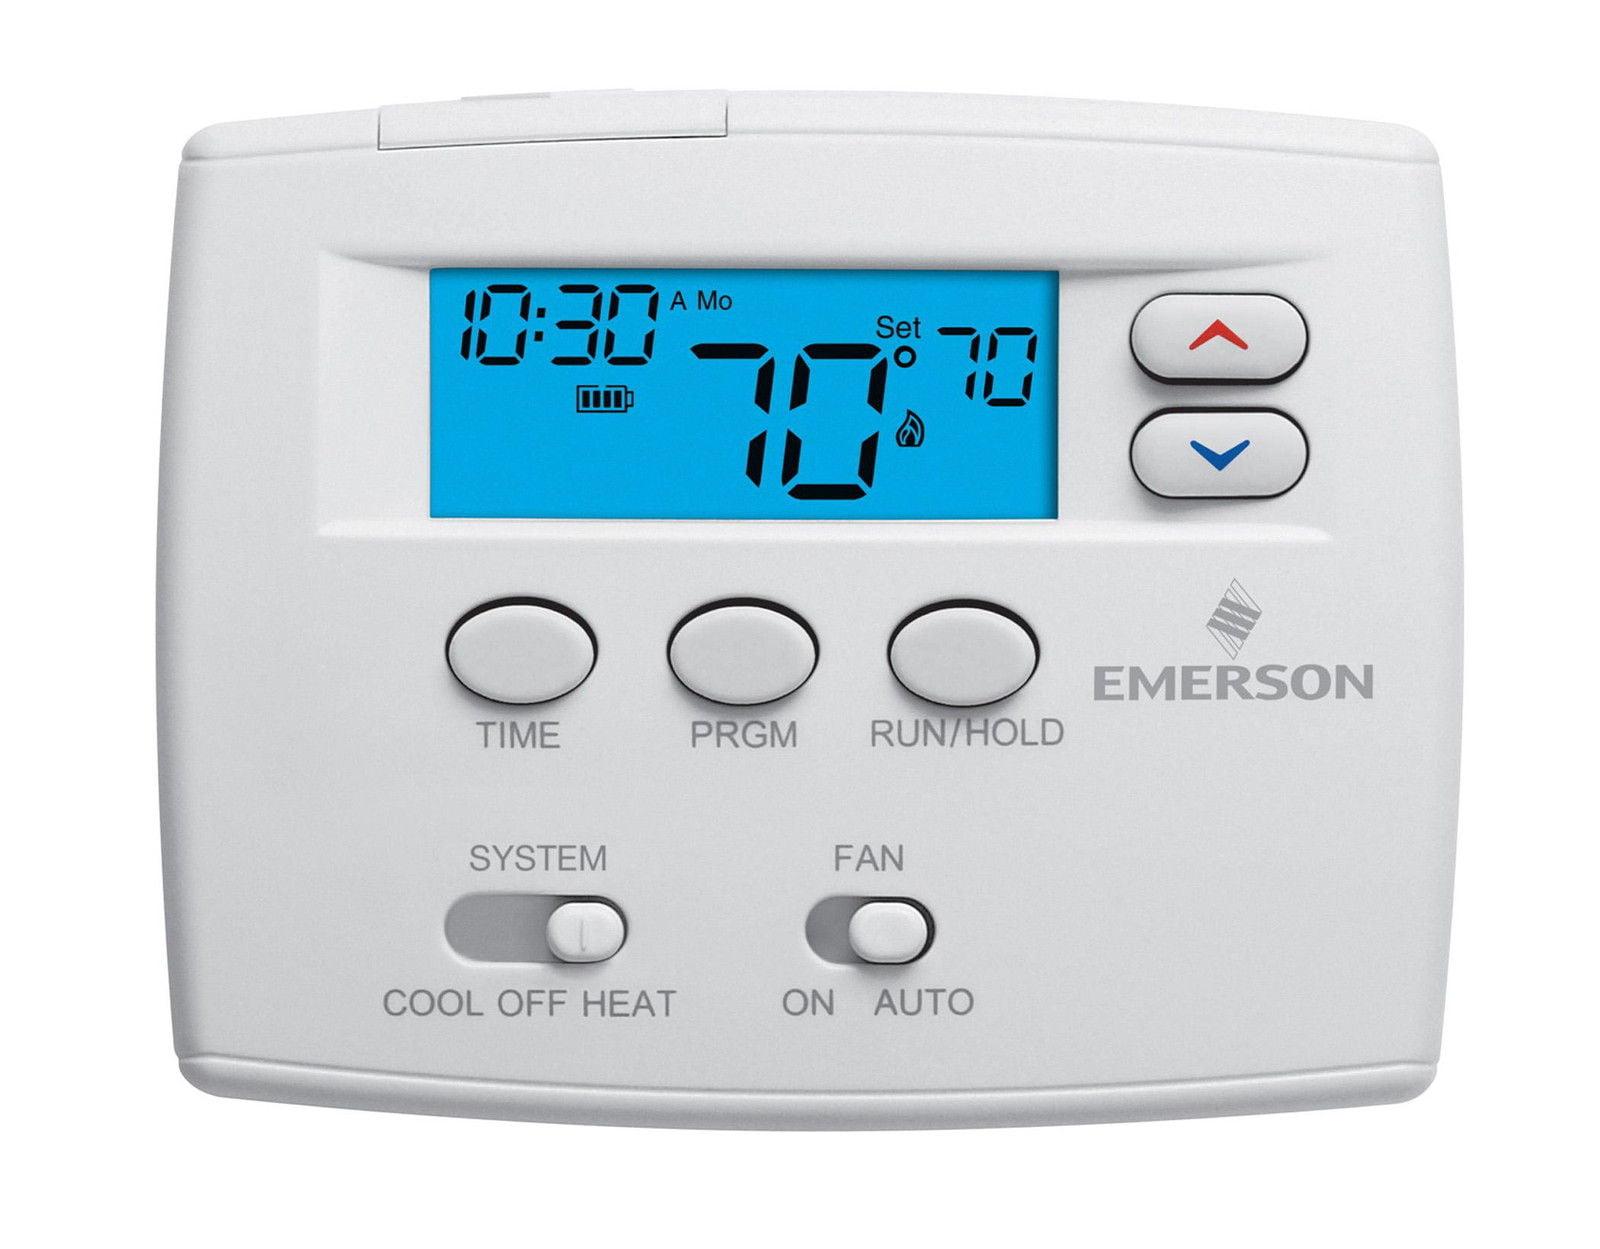 programmable digital thermostat 1f80 0261 walmart com rh walmart com White Rodgers Thermostat Operating Manuals emerson big blue universal thermostat manual